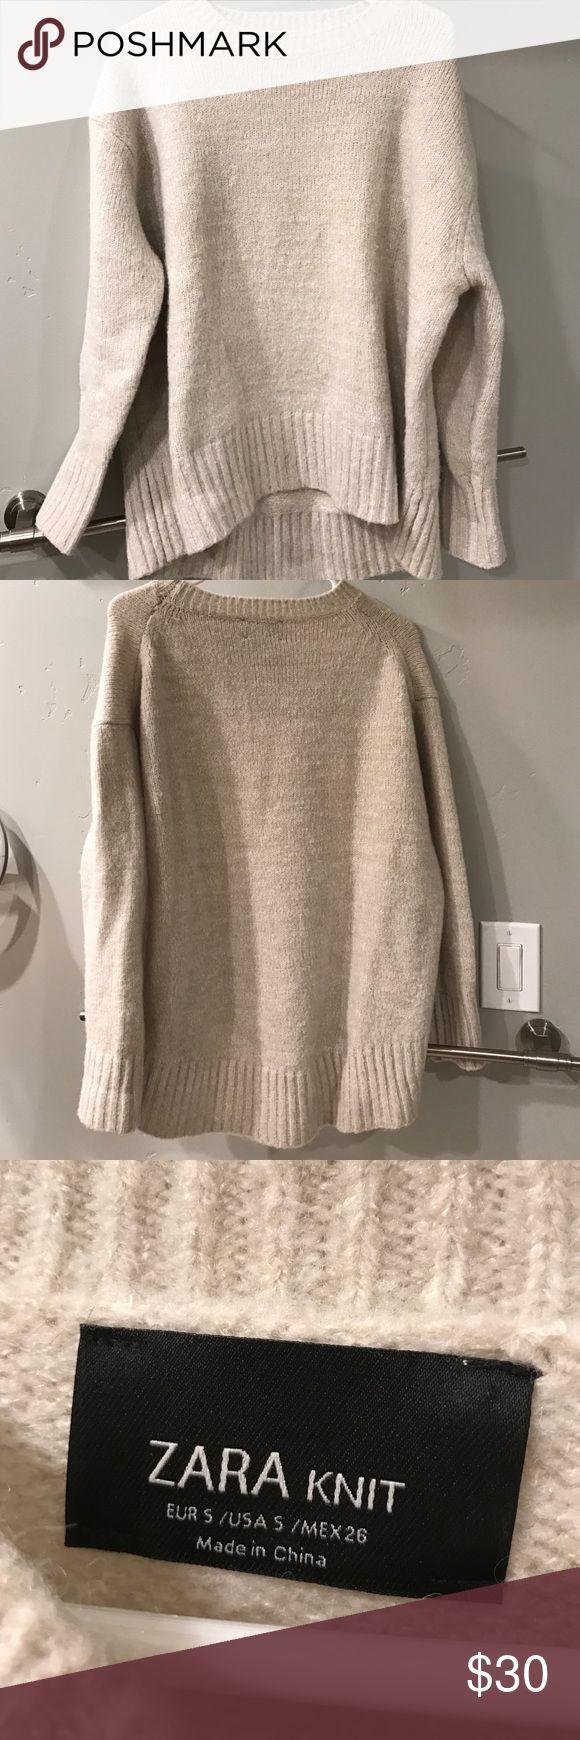 Zara Oversized Knit Sweater Used, excellent condition Zara Sweaters Crew & Scoop Necks